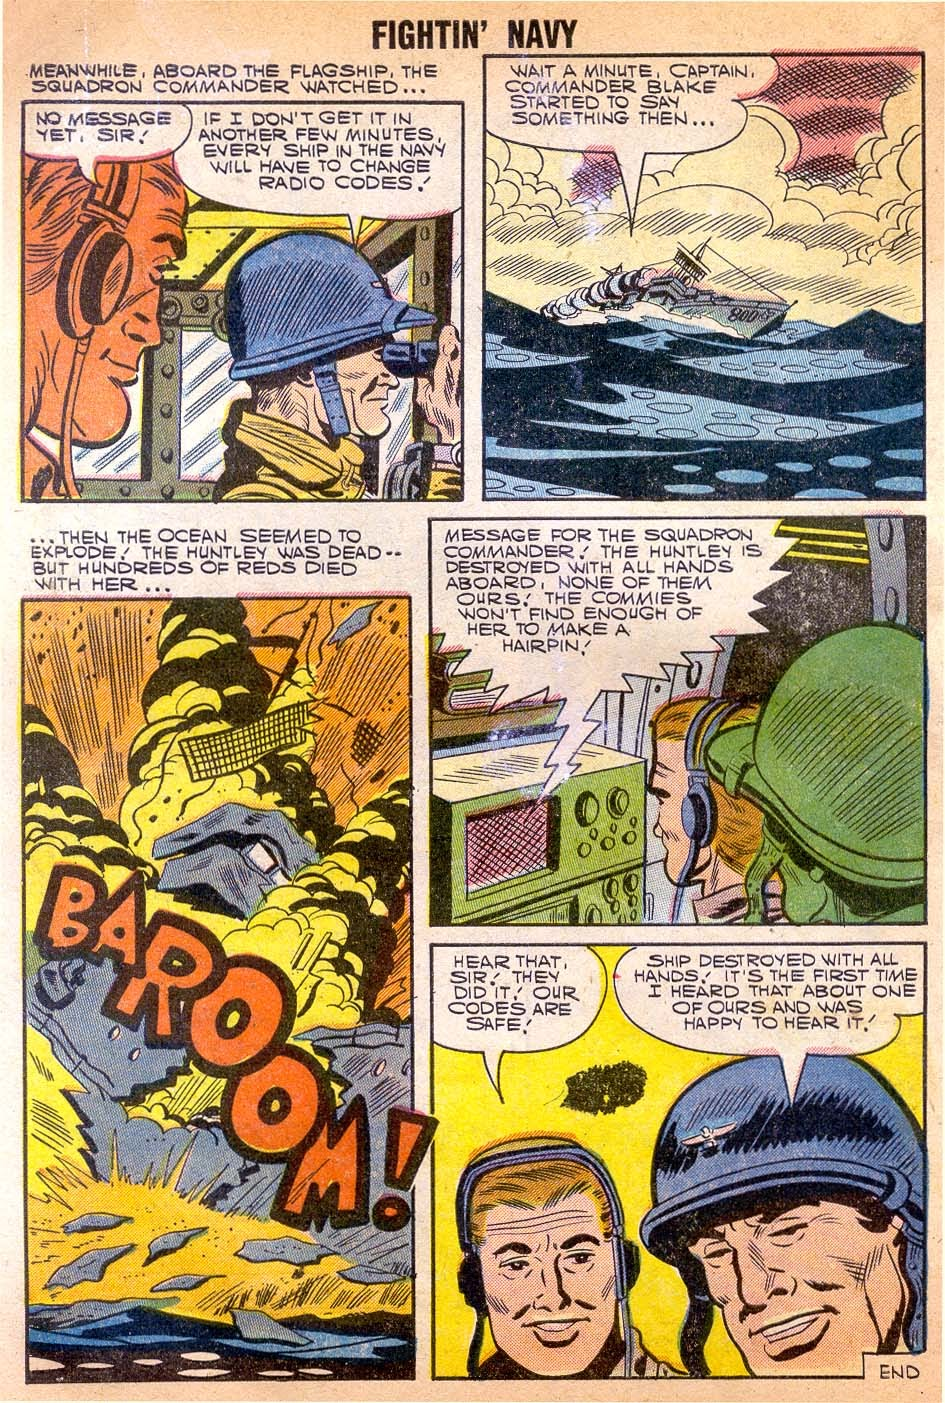 Read online Fightin' Navy comic -  Issue #79 - 32